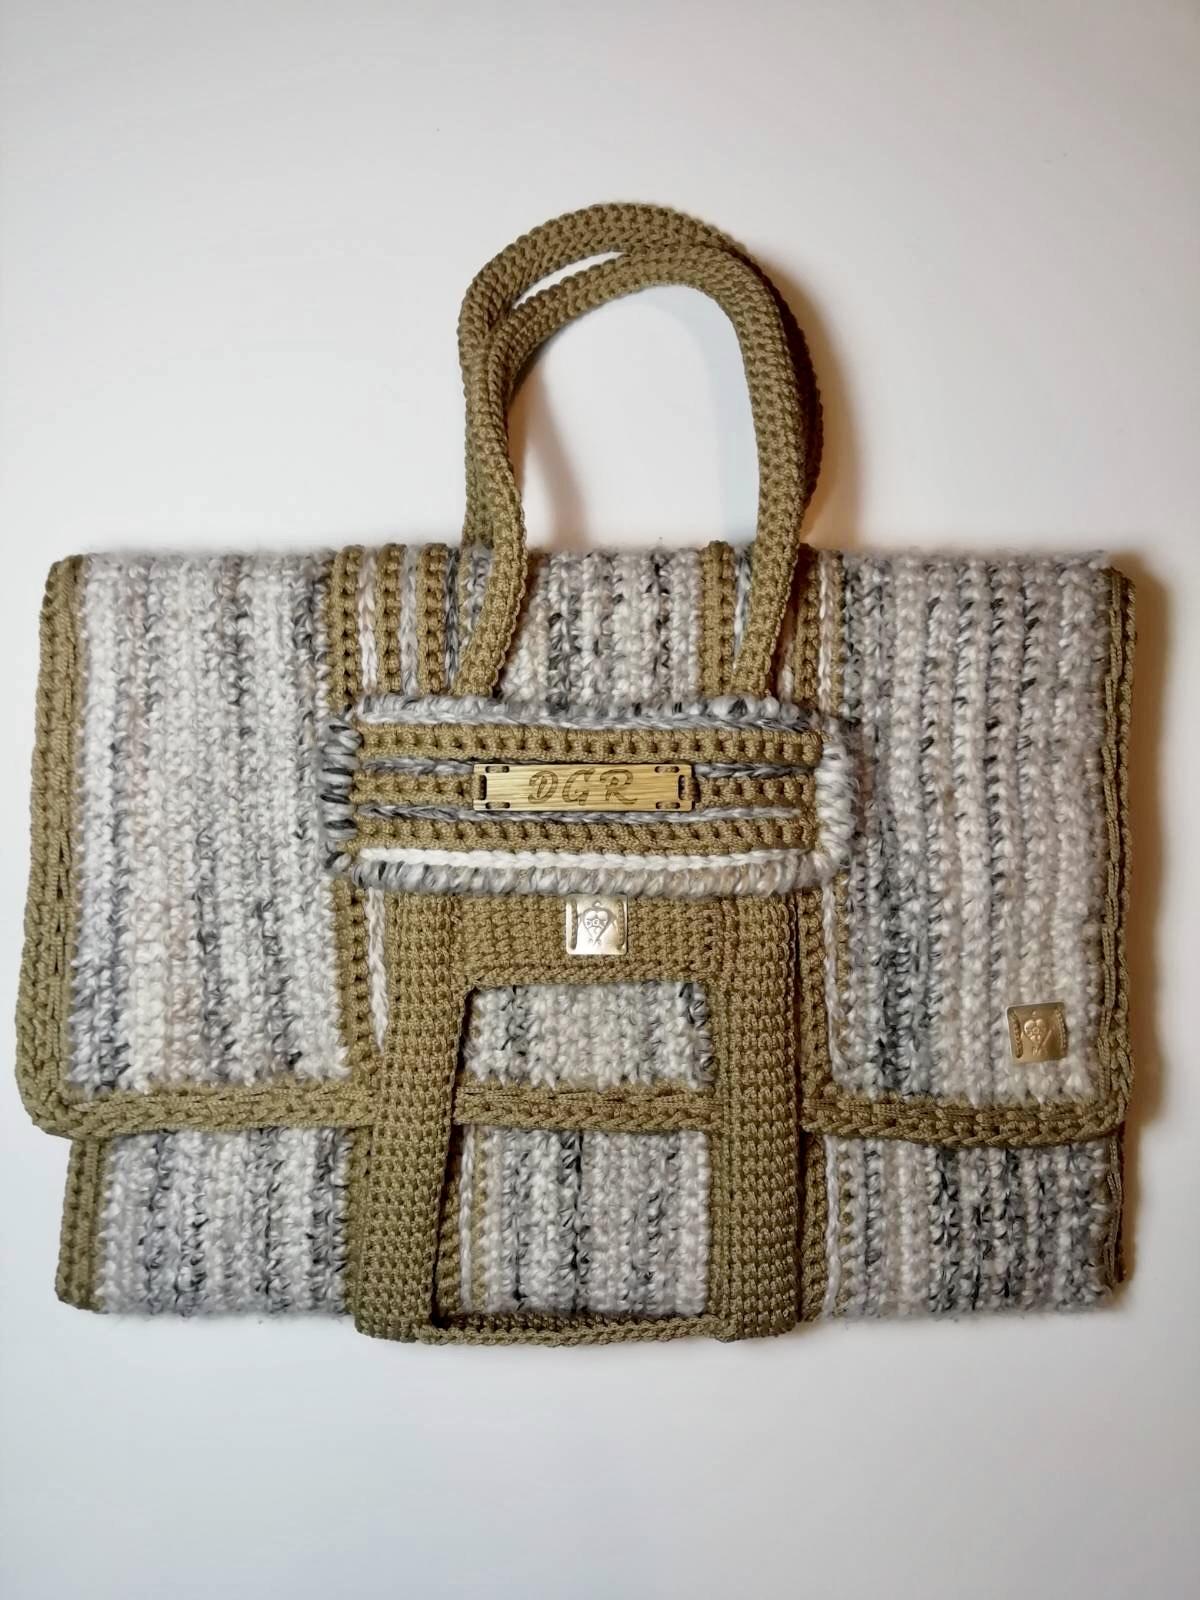 Crochet Bag in beige/mocca